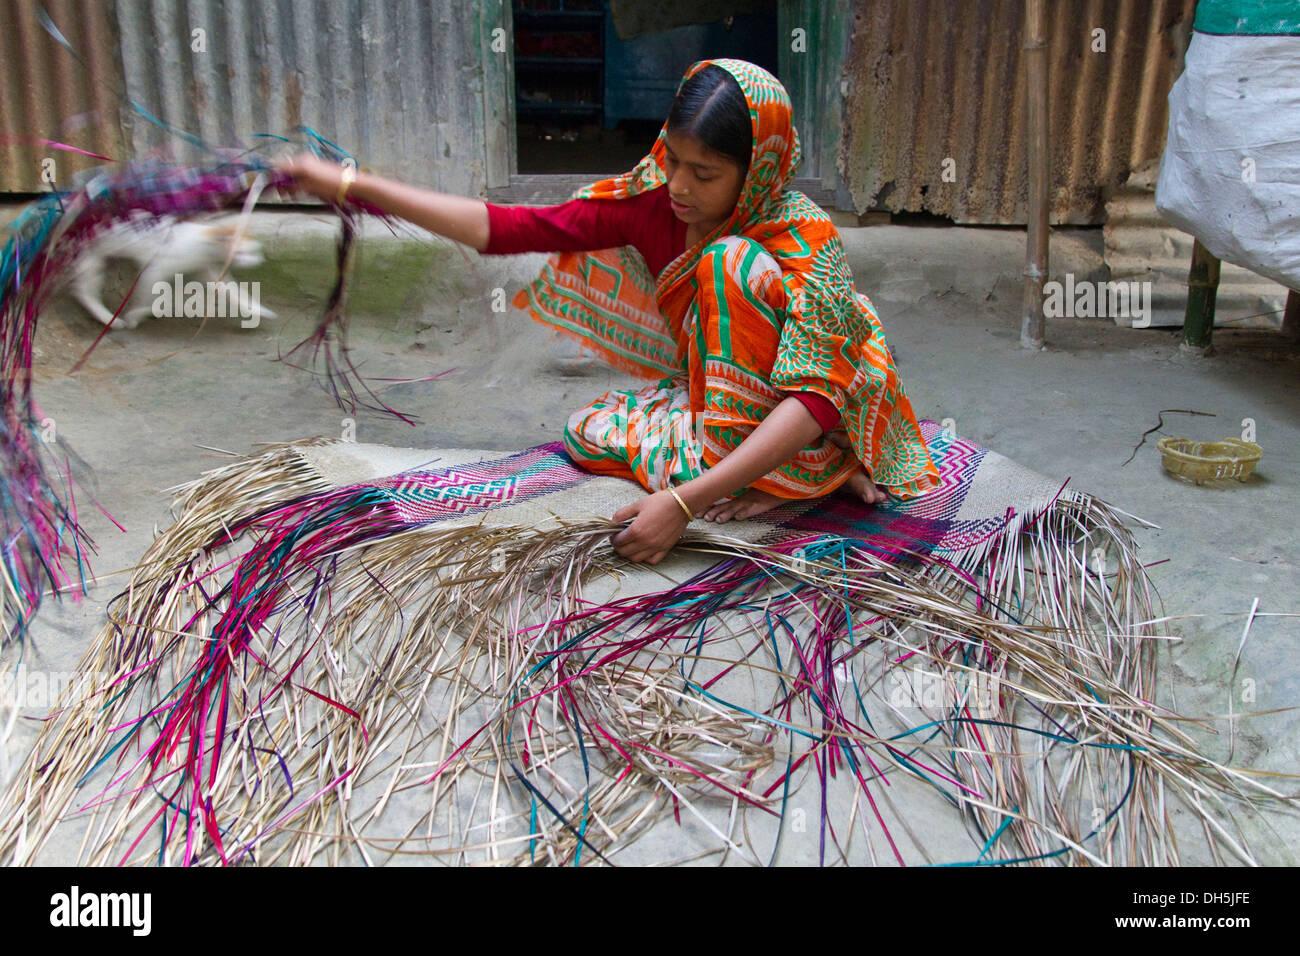 Young woman weaving raffia in front of a tin-sheet home, Barakandi, Sirajganj, Bangladesh, South Asia - Stock Image